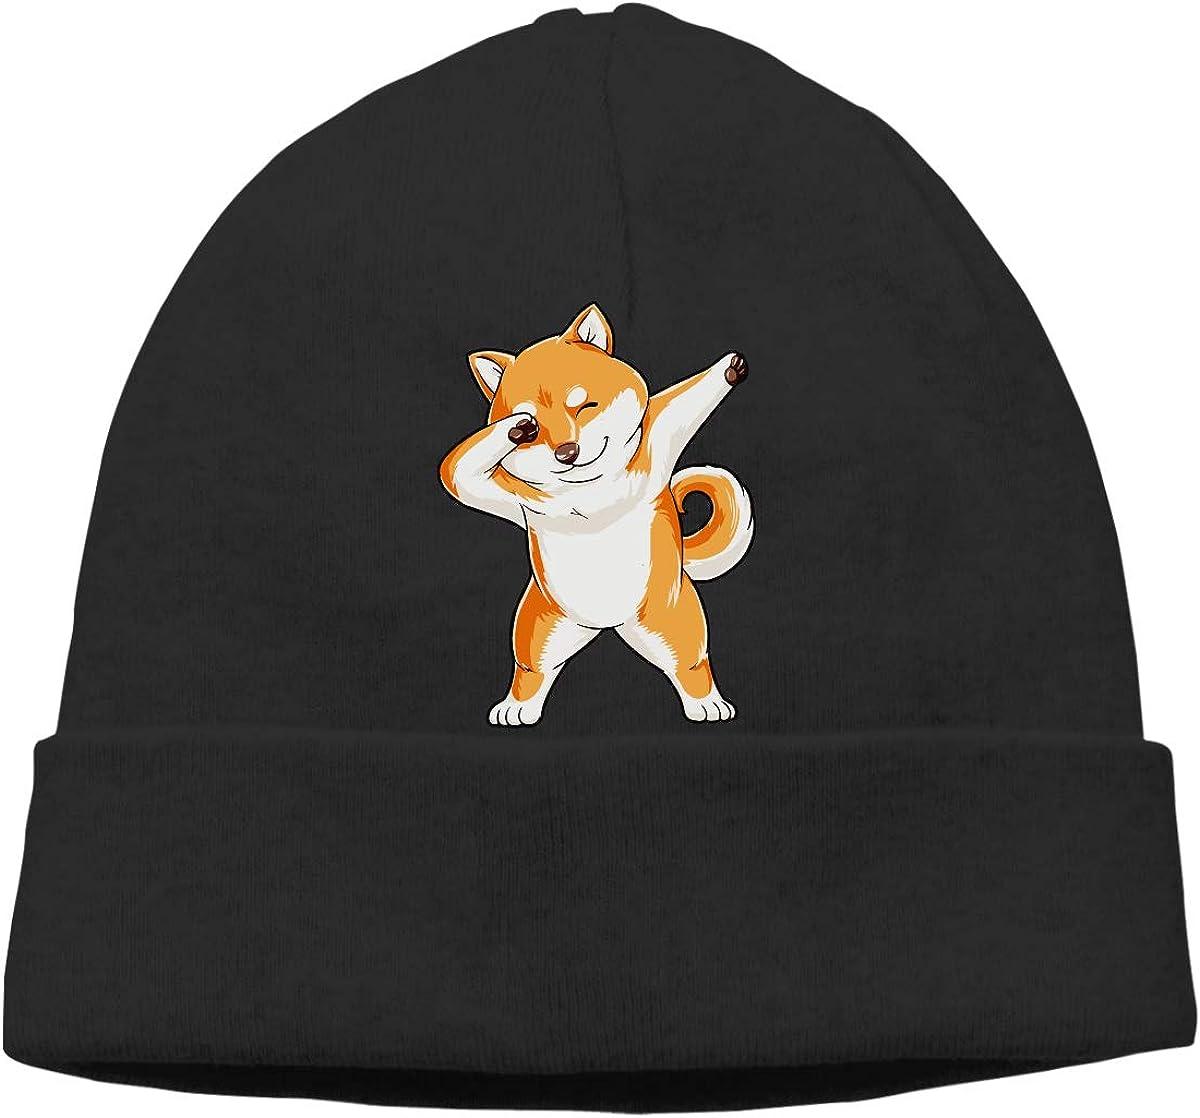 Wool Skull Cap BF5Y3z/&MA Mens and Womens Dabbing Doge Shiba Inu Knitting Hat